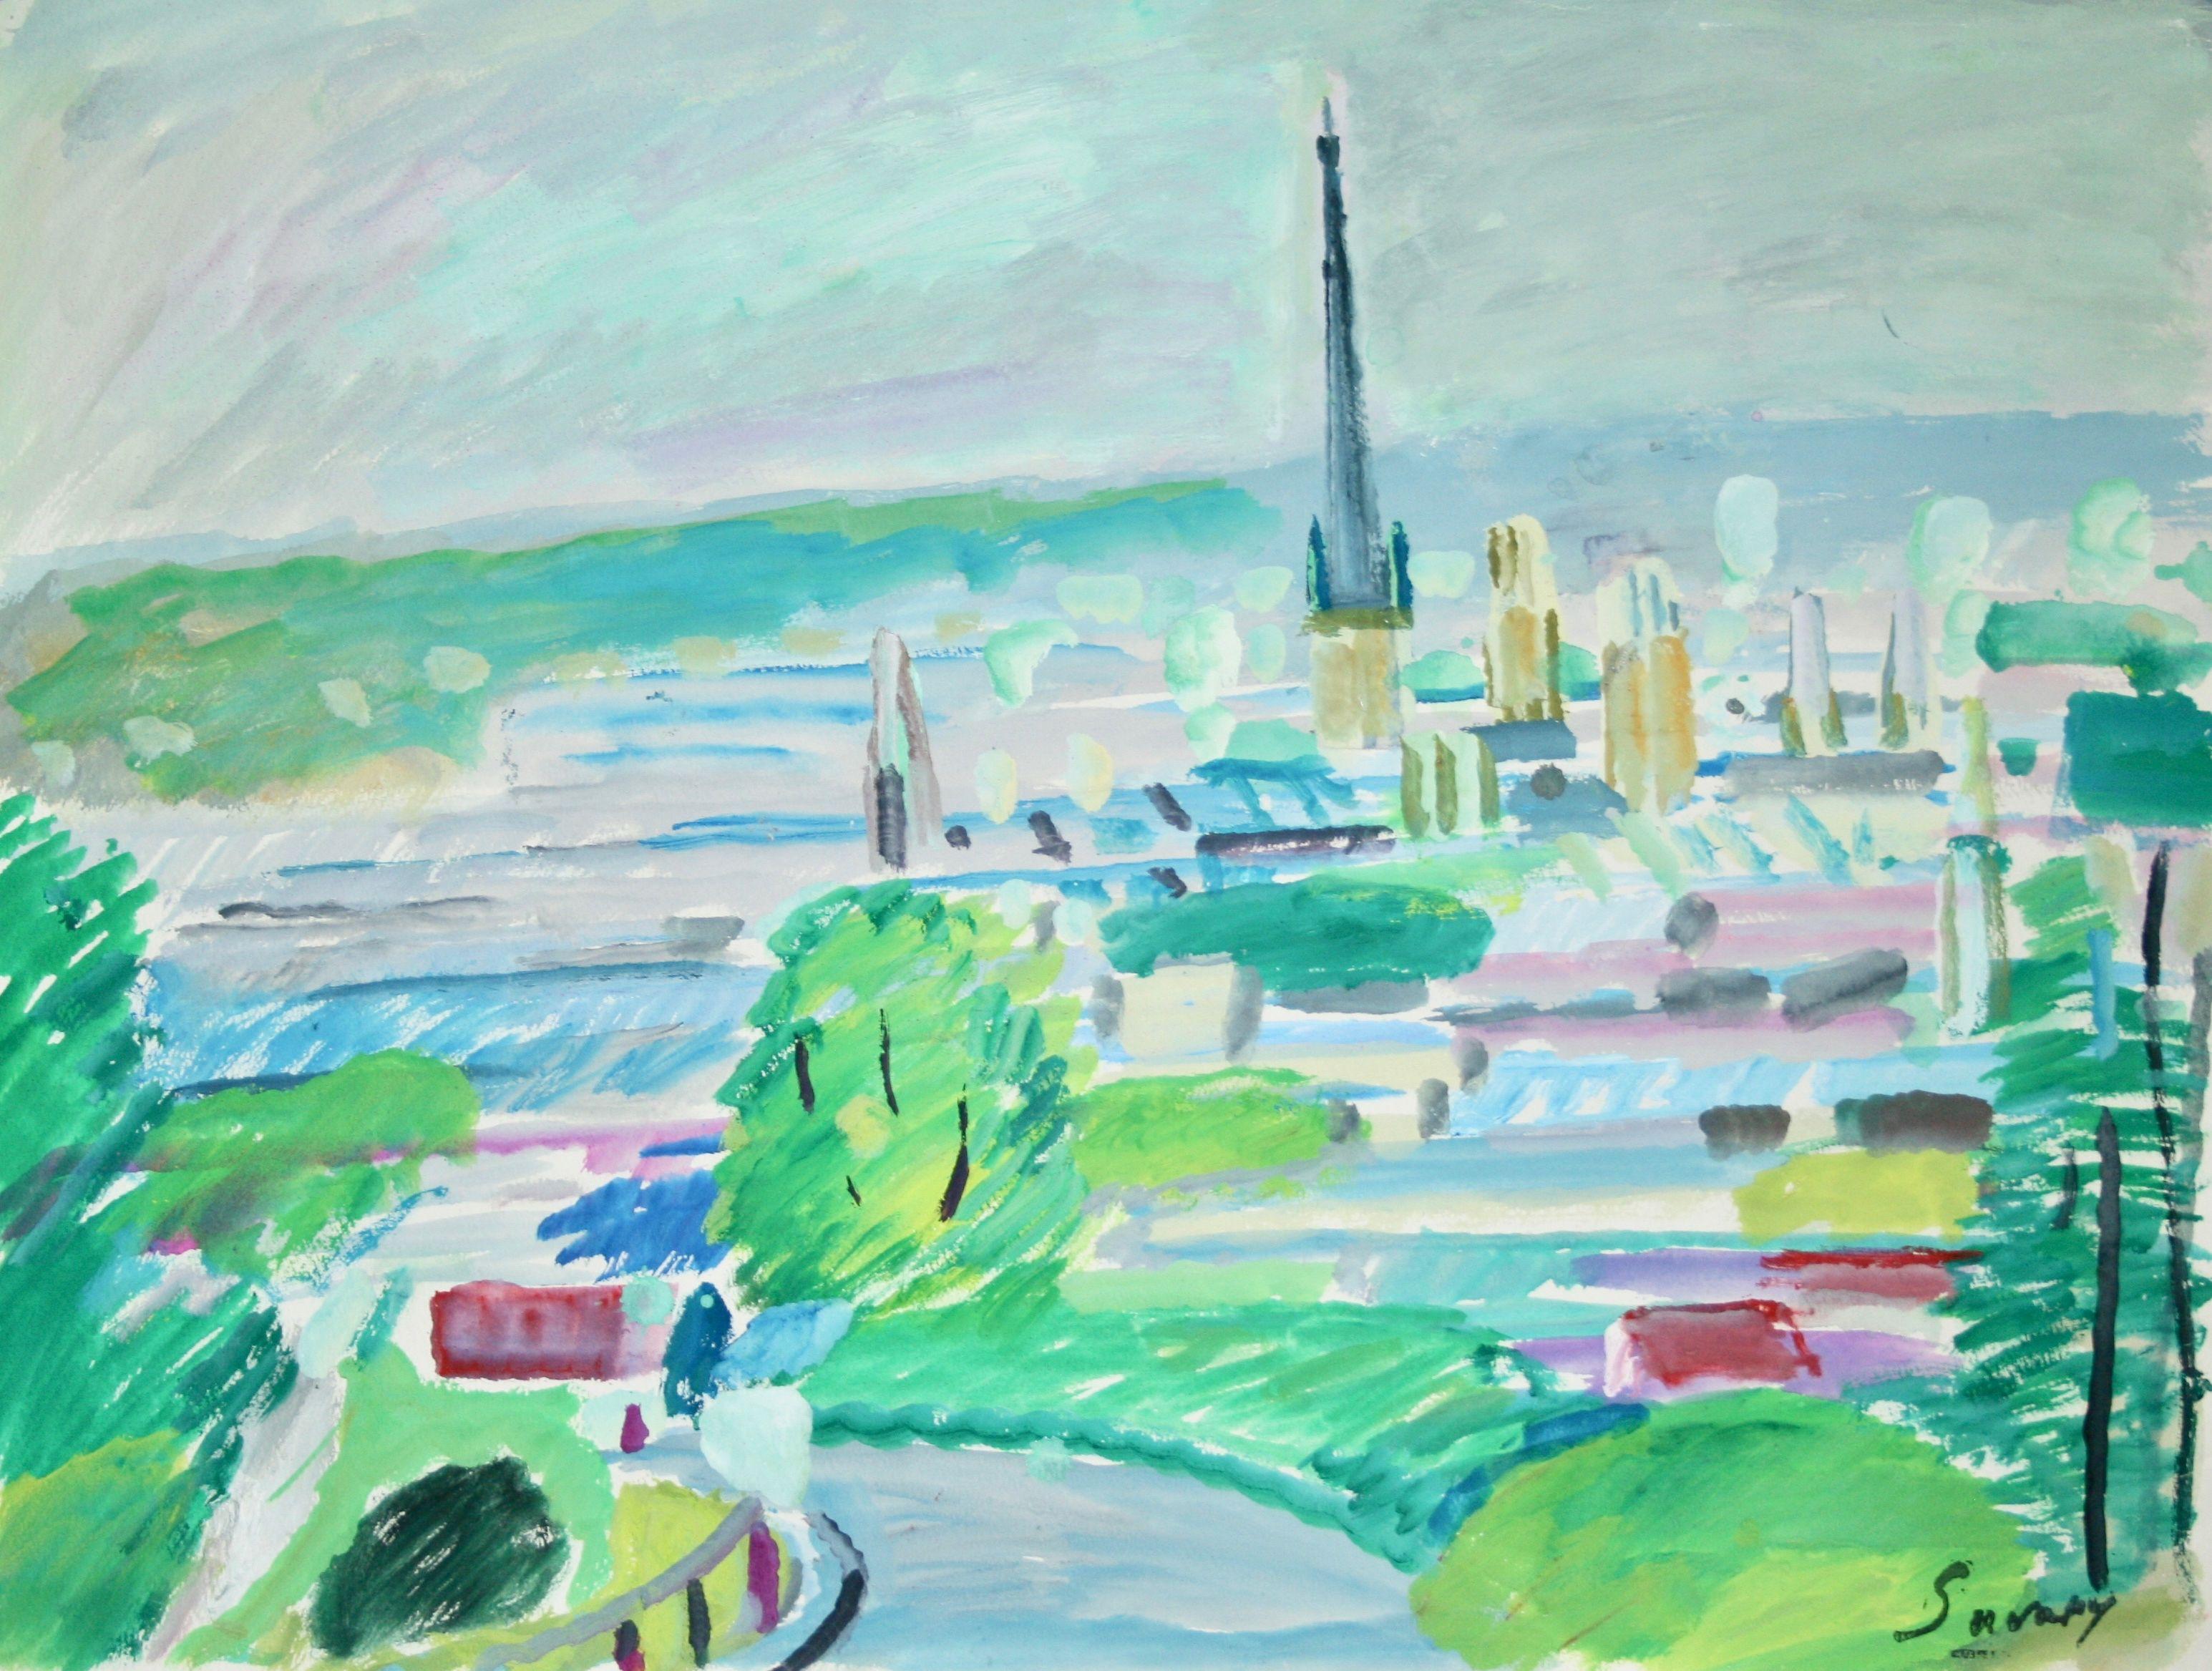 Peintres Ecole De Rouen robert savary - peinture originale - gouache - vue de rouen